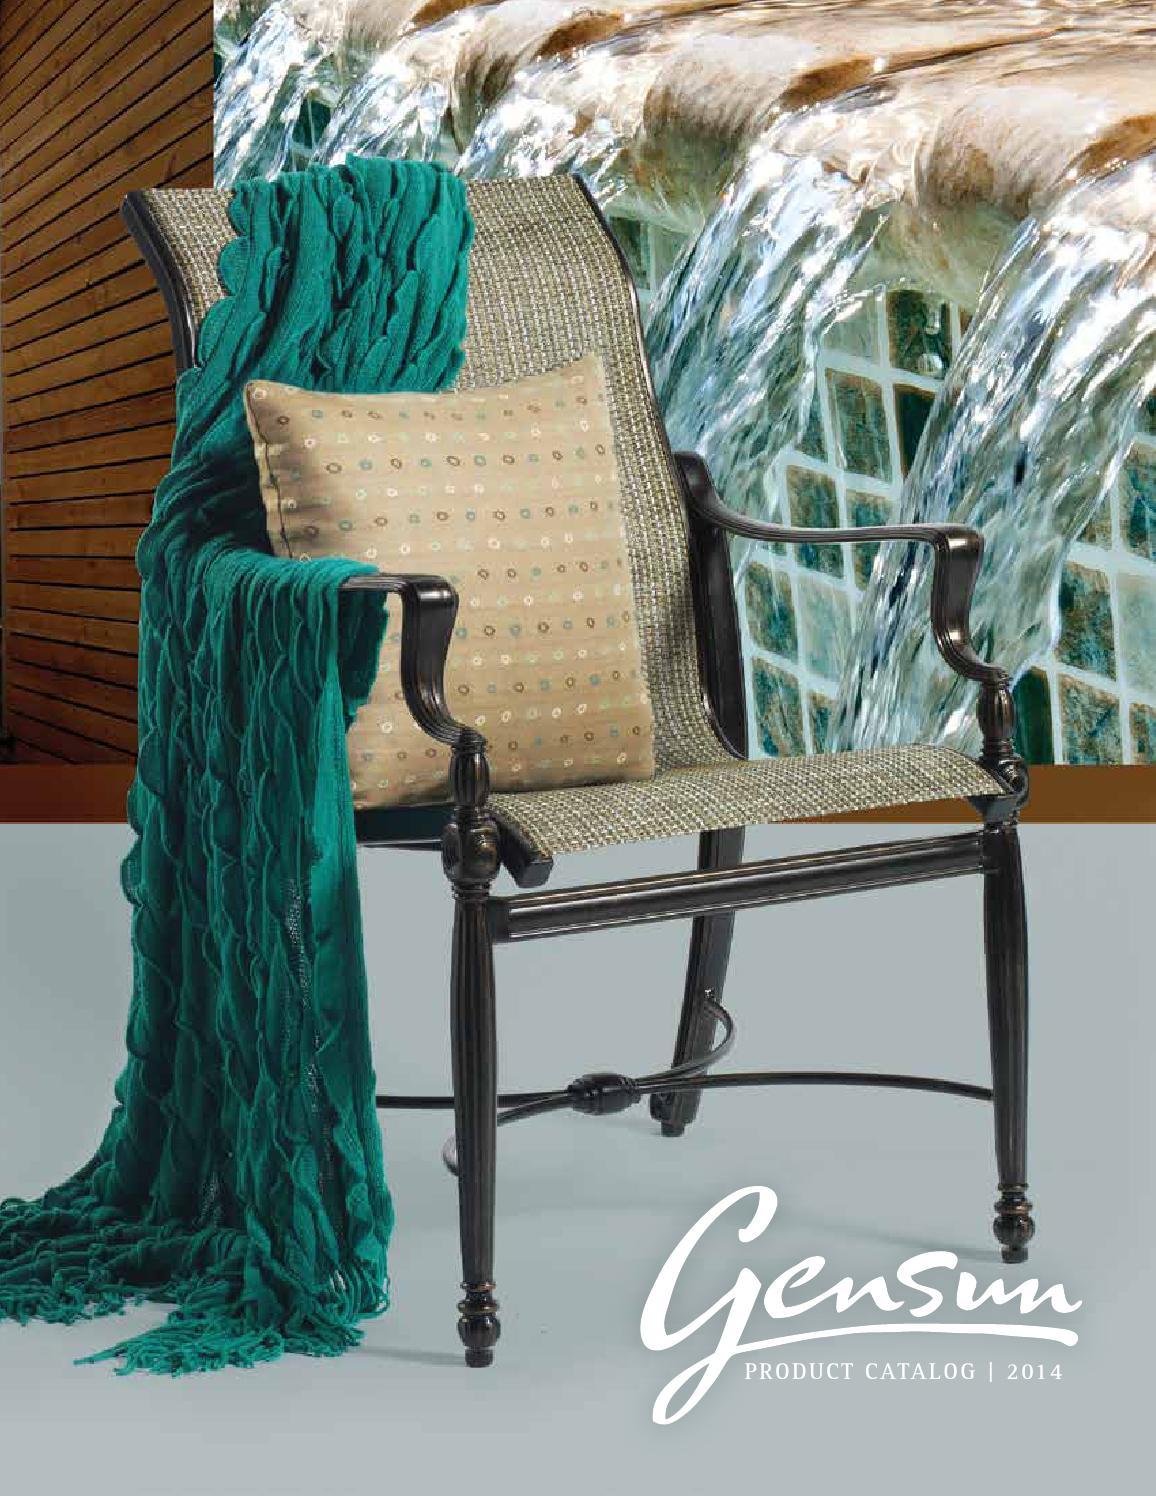 Gensun Casual Living : Gensun casual furniture catalog 2014 by Marx Fireplaces ...